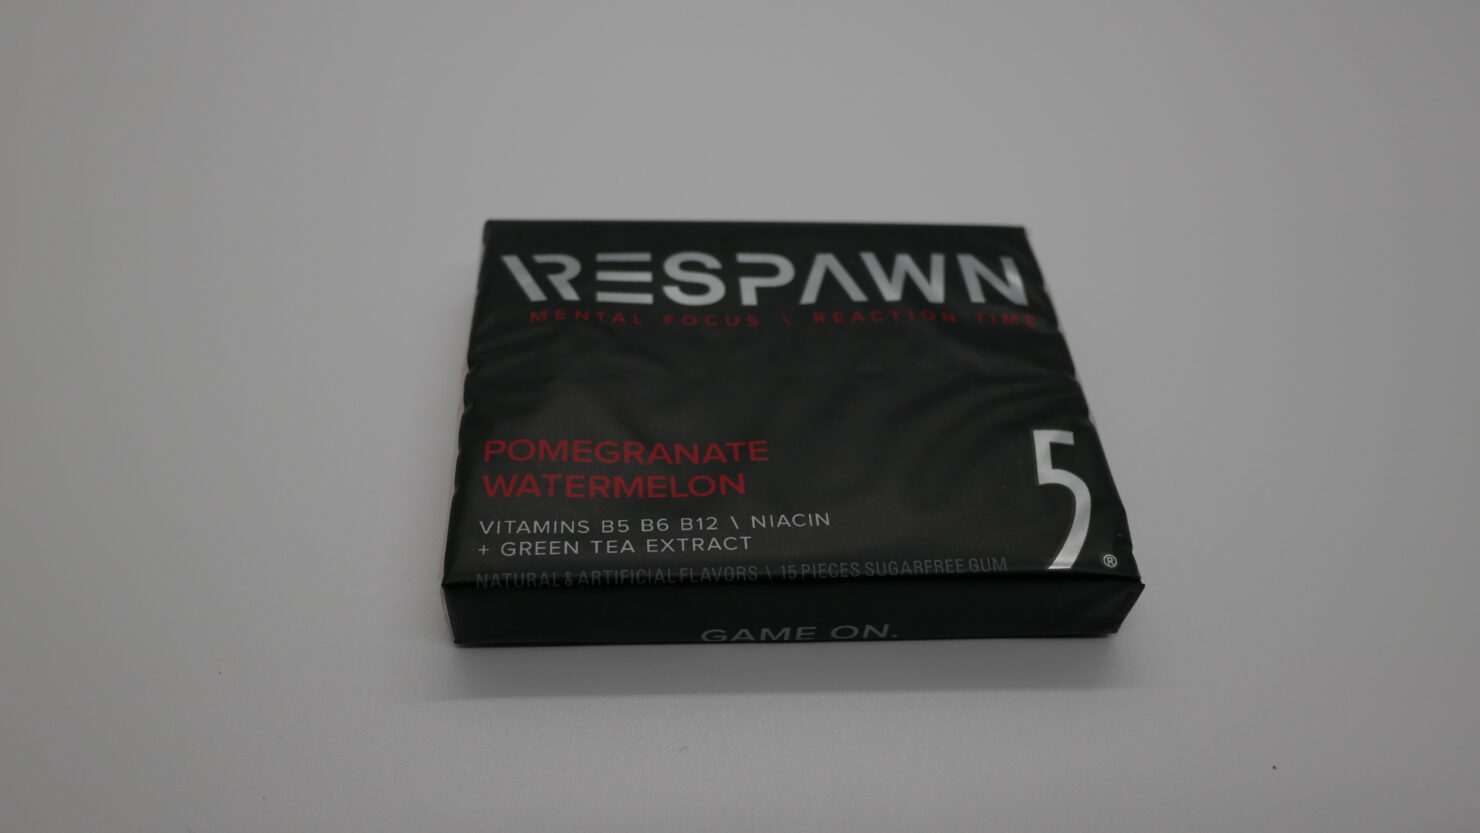 respawn-pomegranate